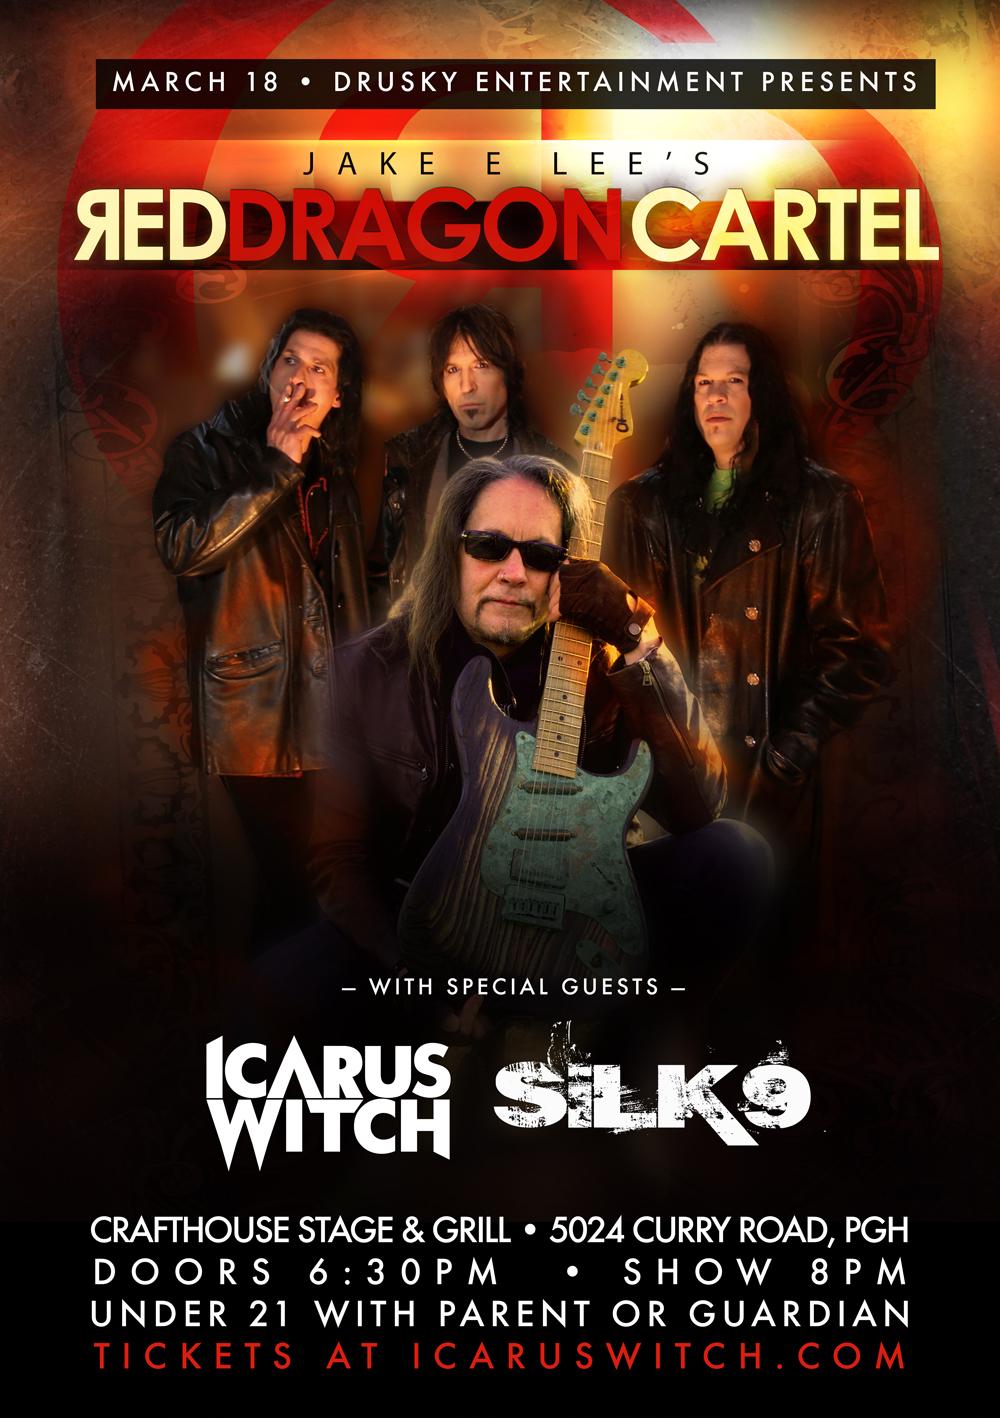 Red-Dragon-Cartel-Flyer_bigCartel.jpg